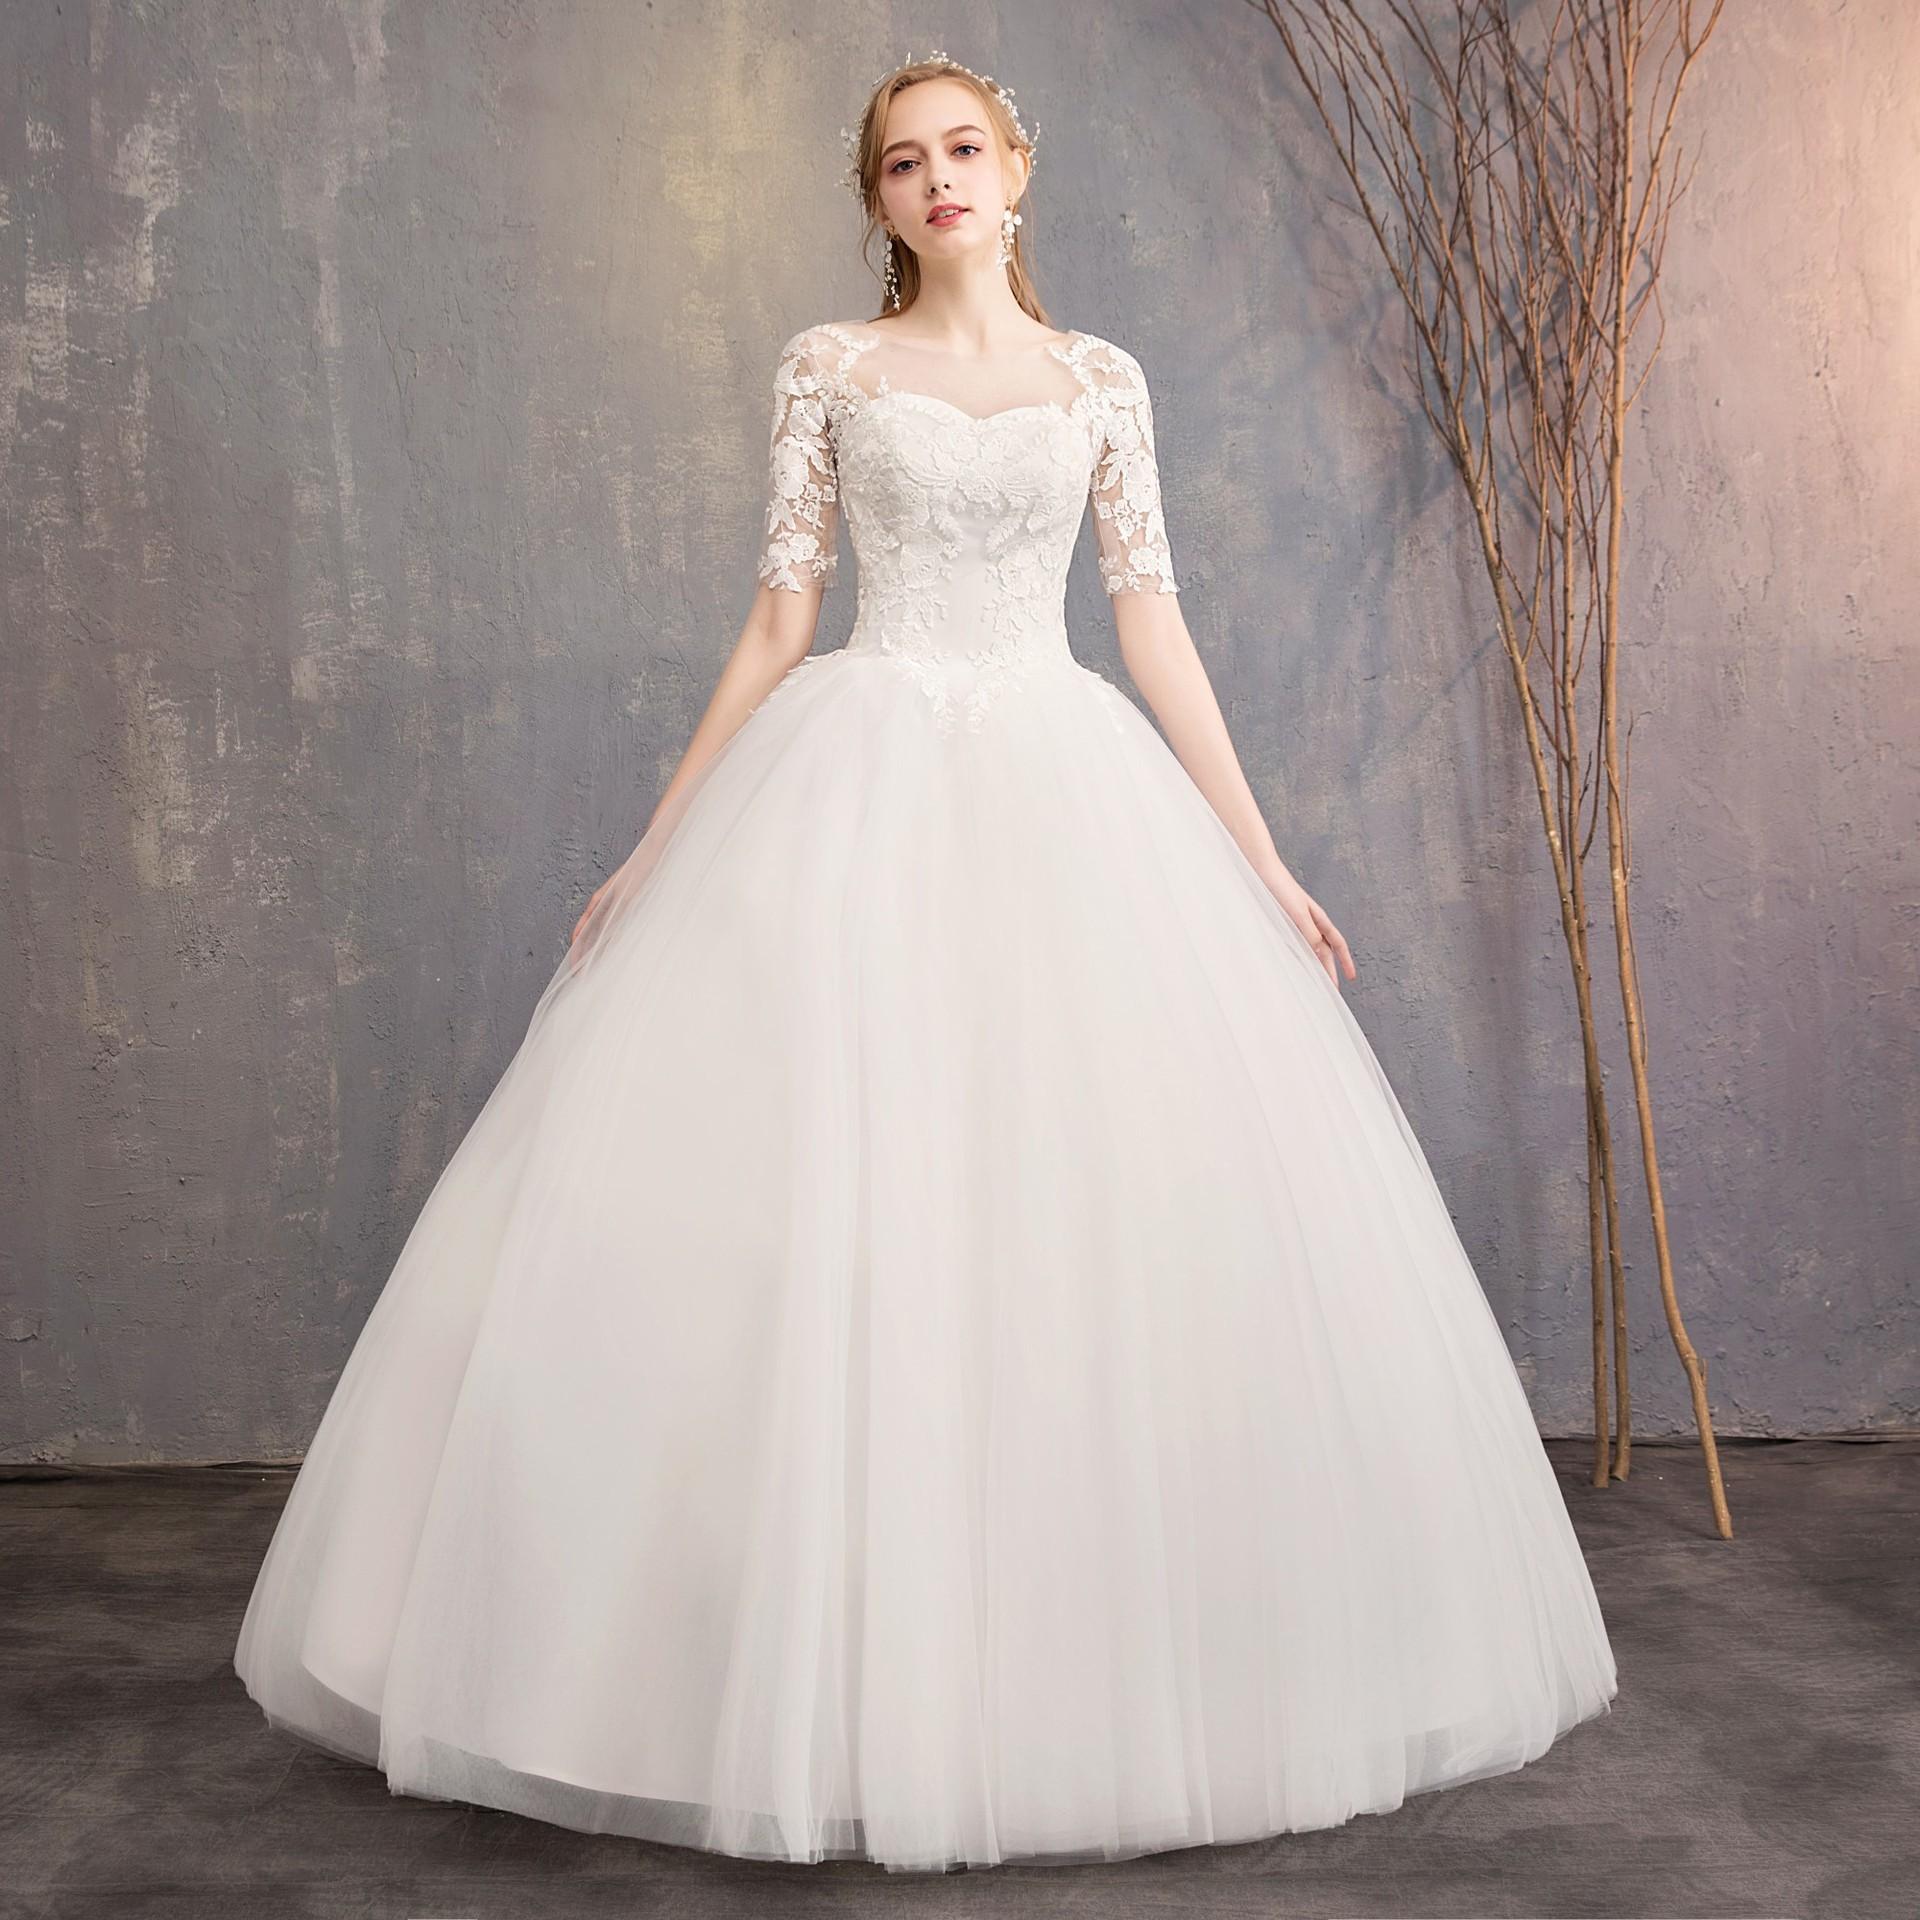 Vestido De Noiva Elegant Cream Wedding Dresses Ball Gown Lace Up Embroidery Sweetheart Formal Bride Dresses Robe De Mariee 2020